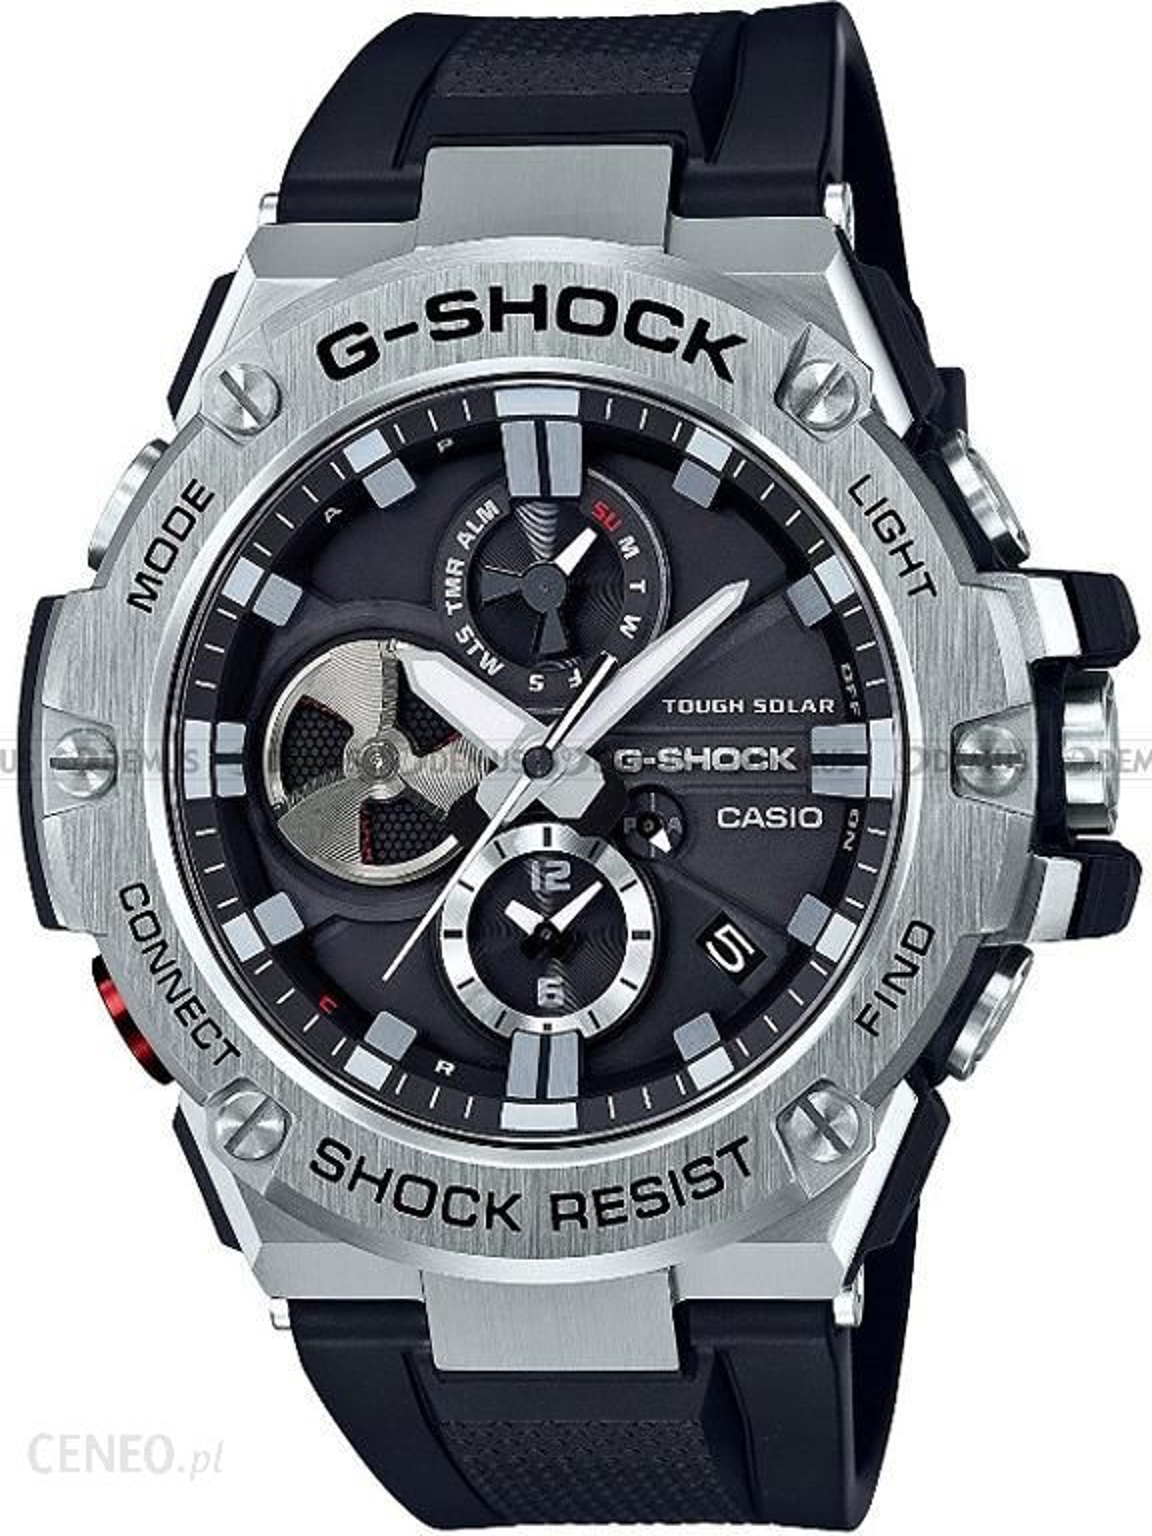 92e12f3d456bbe Casio G-Shock Gsteel Bluetooth GST-B100-1AER - opinie, komentarze o ...